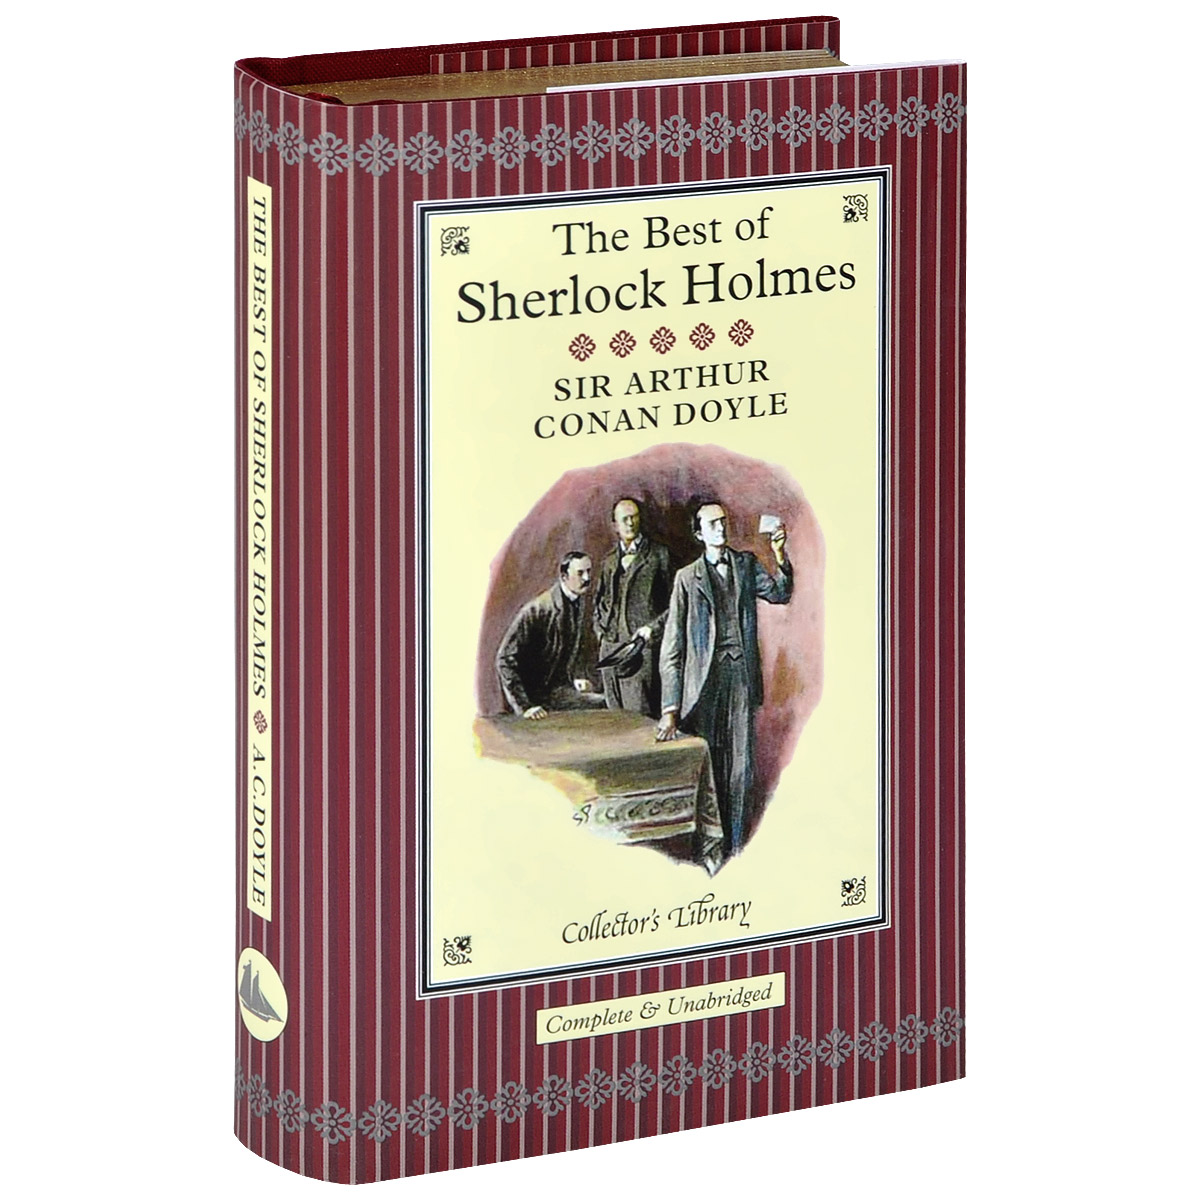 The Best of Sherlock Holmes (подарочное изадние)